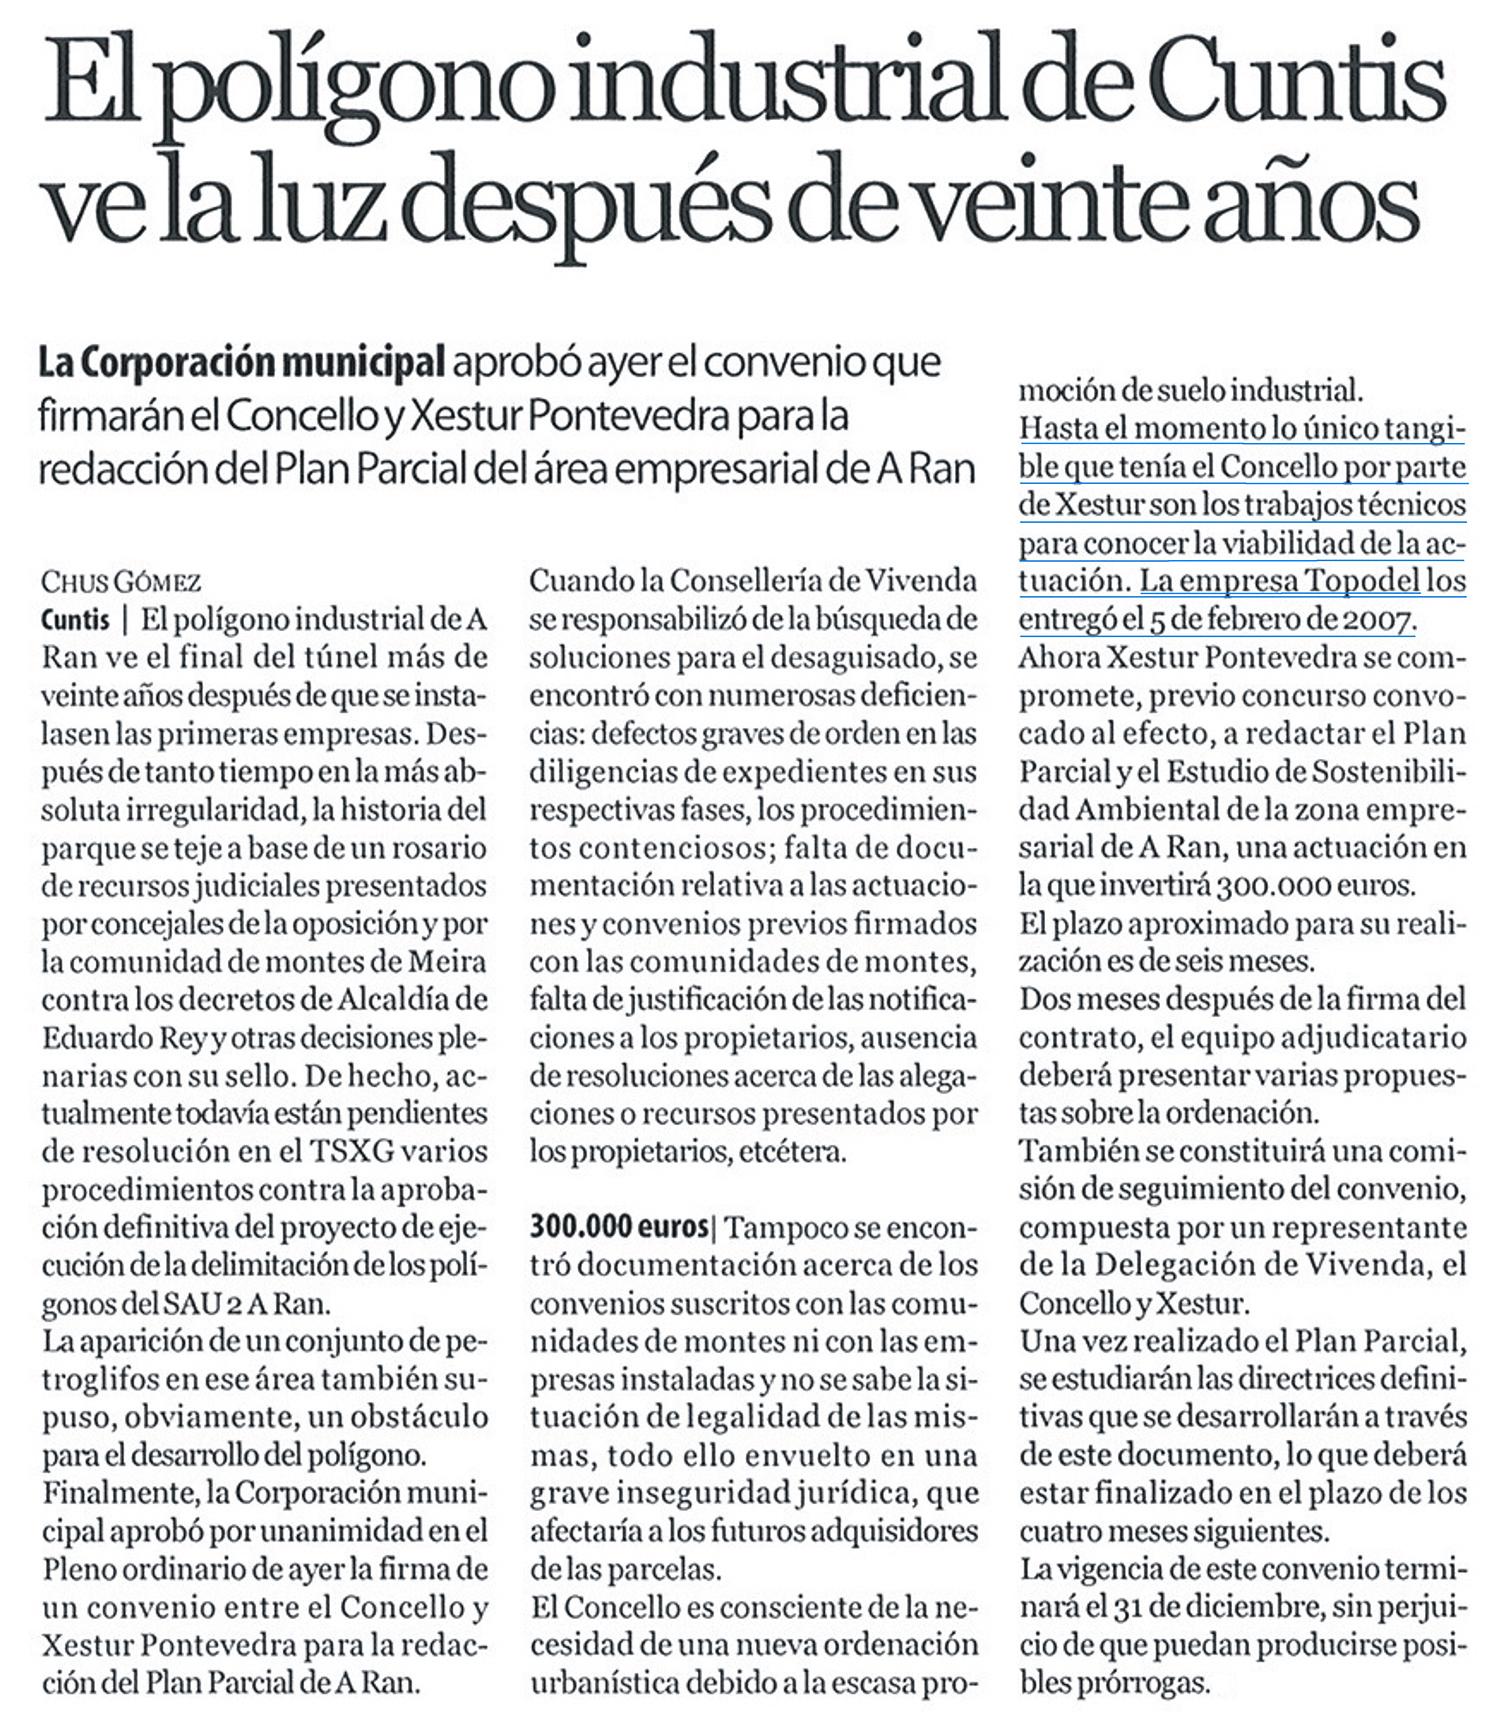 28-04-2007  Diario de Pontevedra